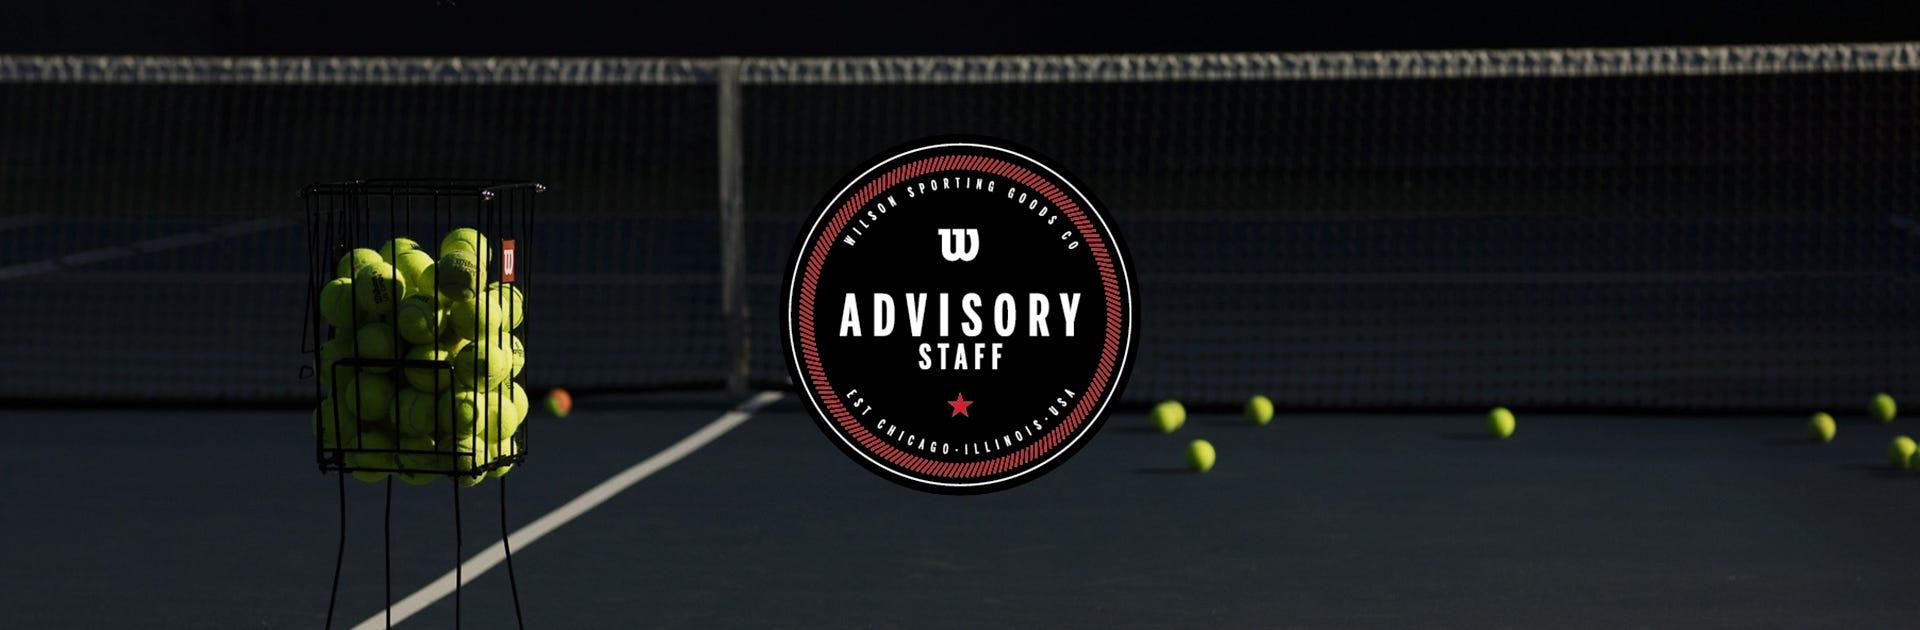 Wilson Tennis Advisory Staff